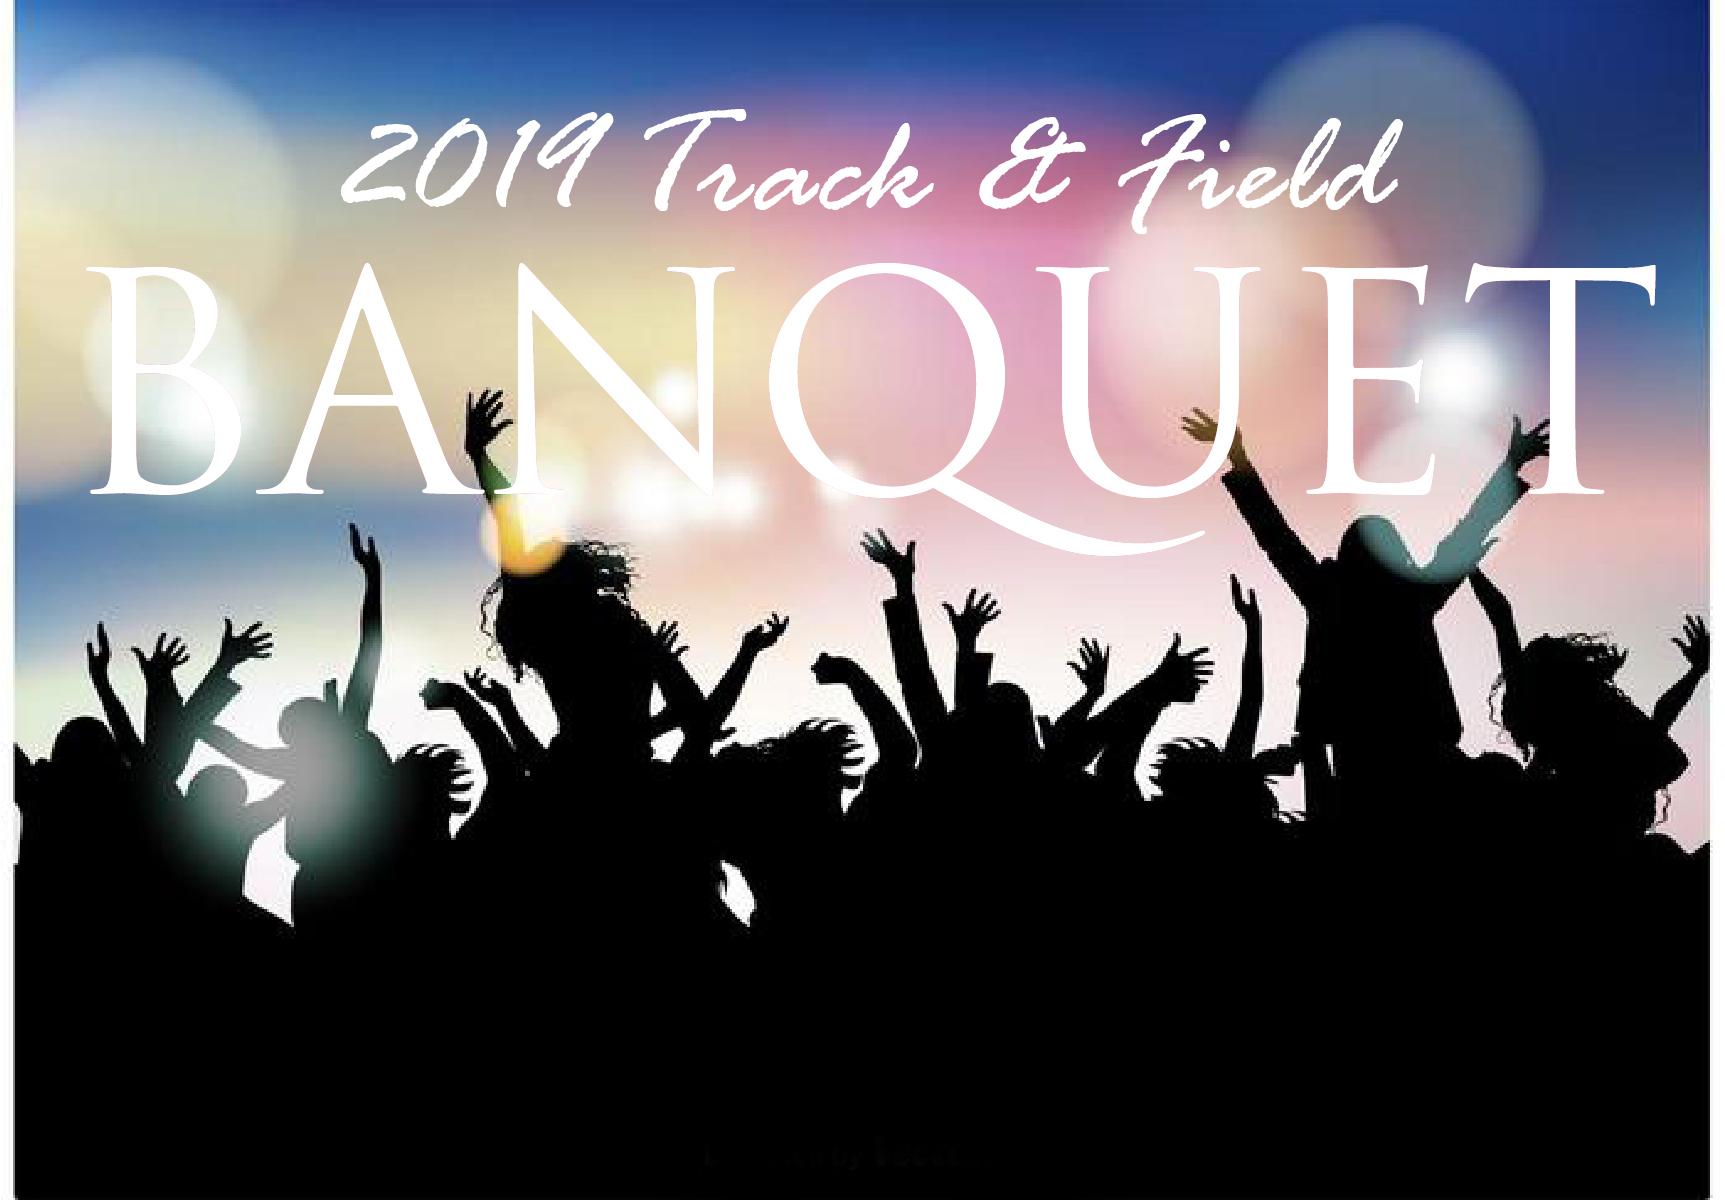 2019 Track & Field BANQUET